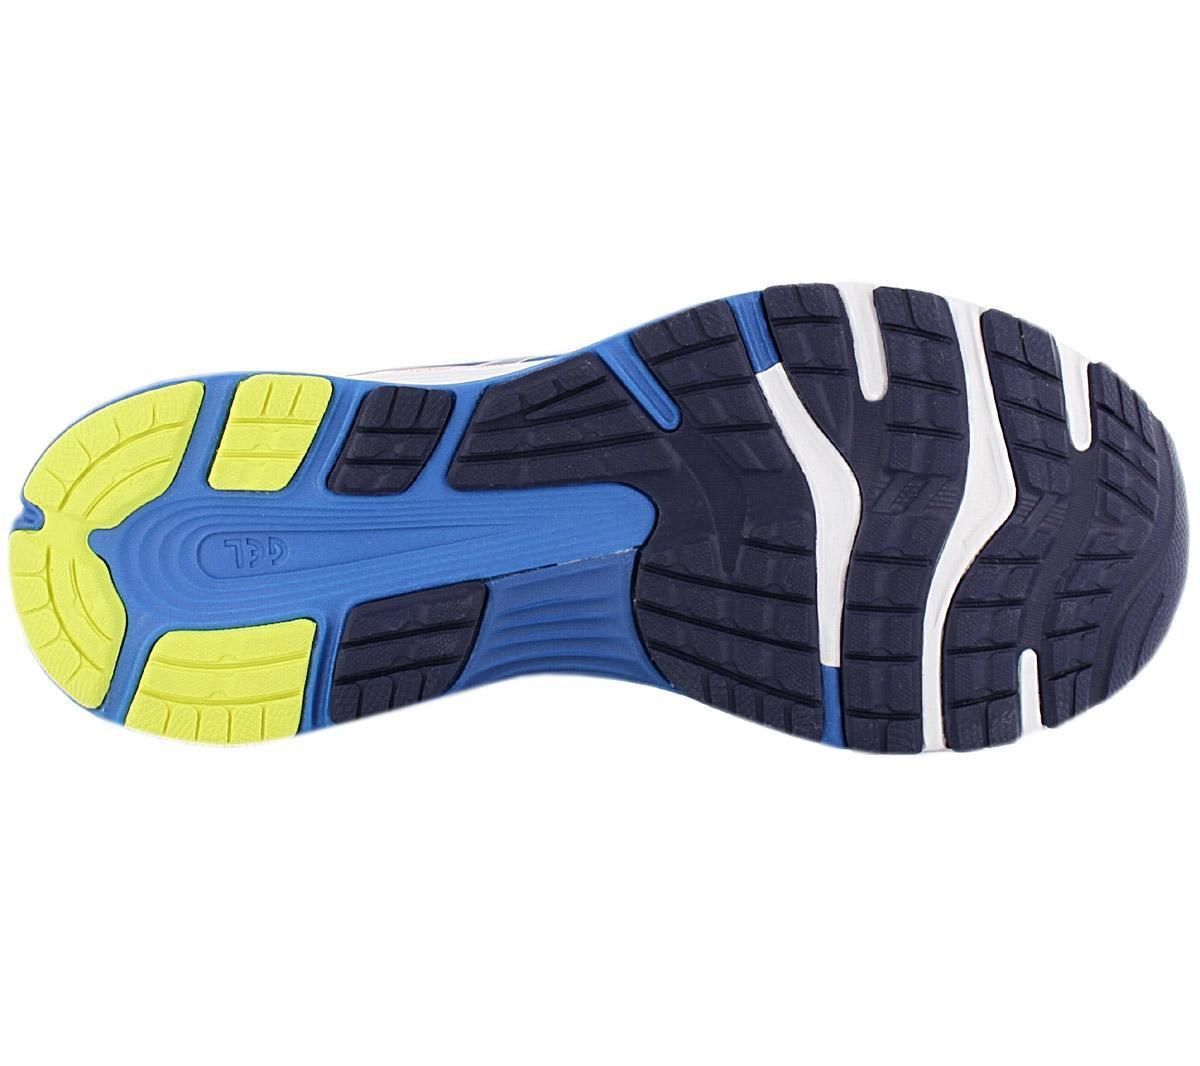 Asics Gel Nimbus 2 Sportschoenen Maat 45 Mannen blauwwitoranje